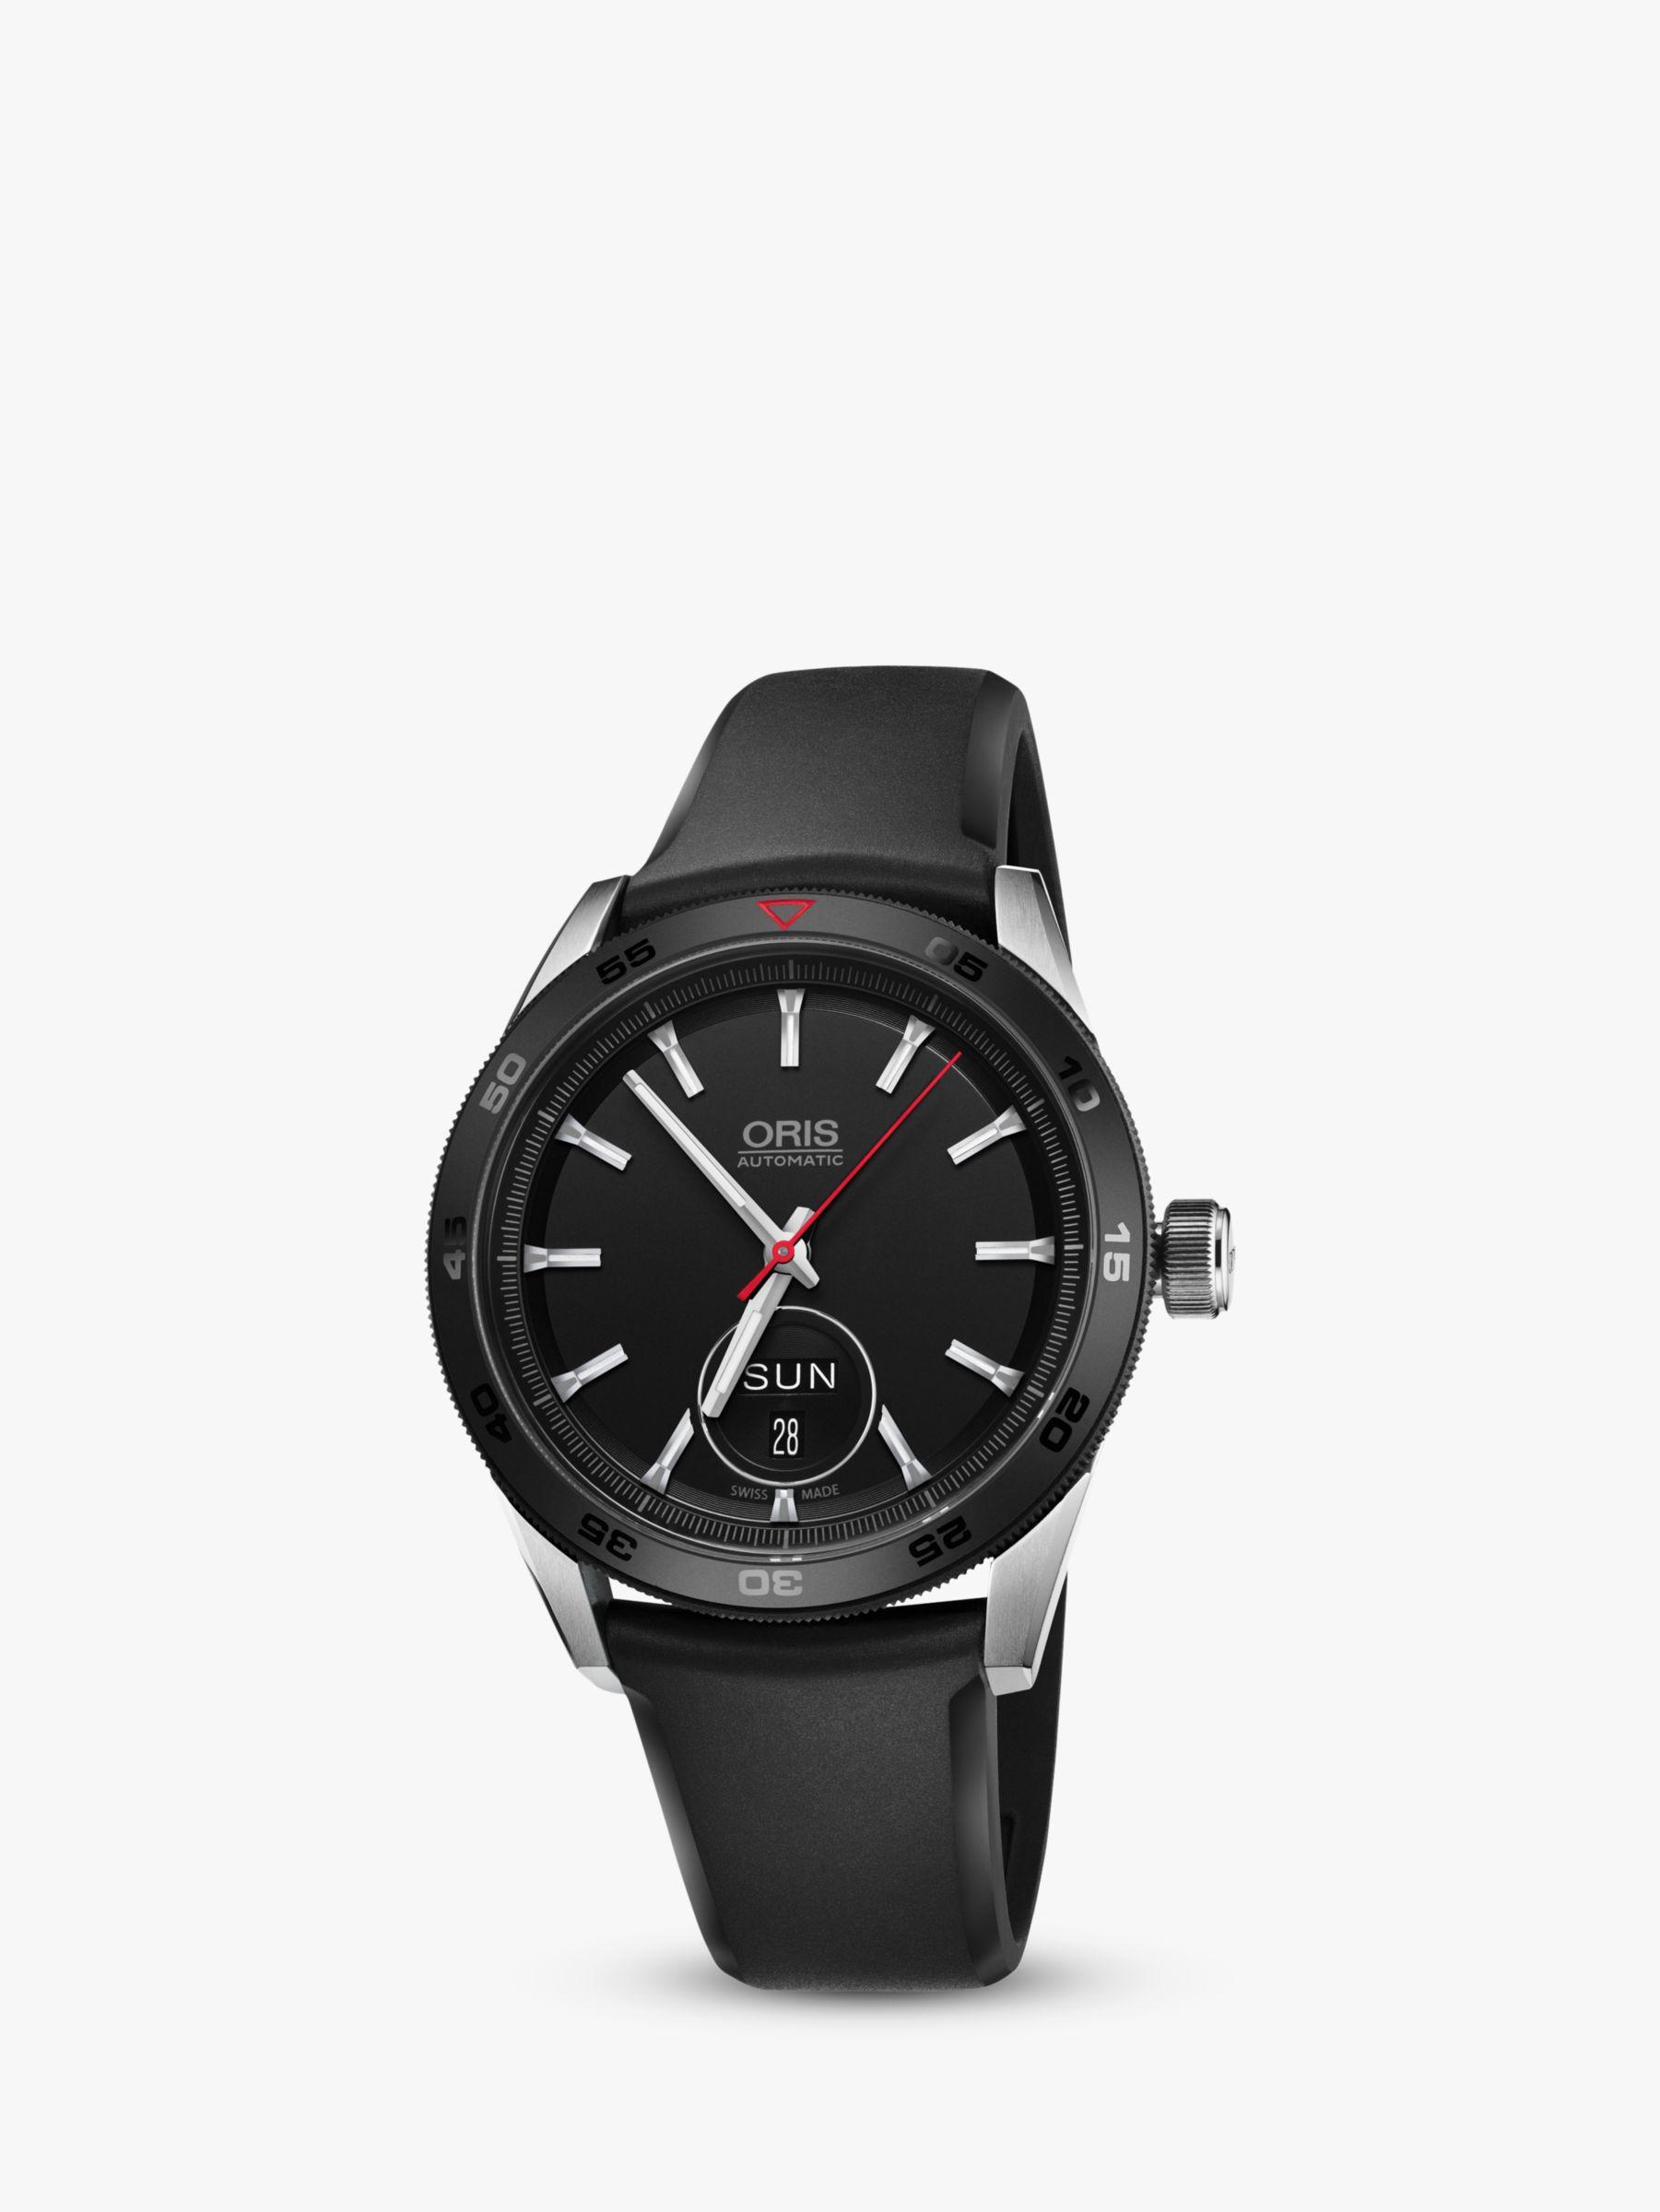 Oris Oris 735 7662 4424-07 4 21 25FC Men's Artix GT Automatic Day Date Rubber Strap Watch, Black